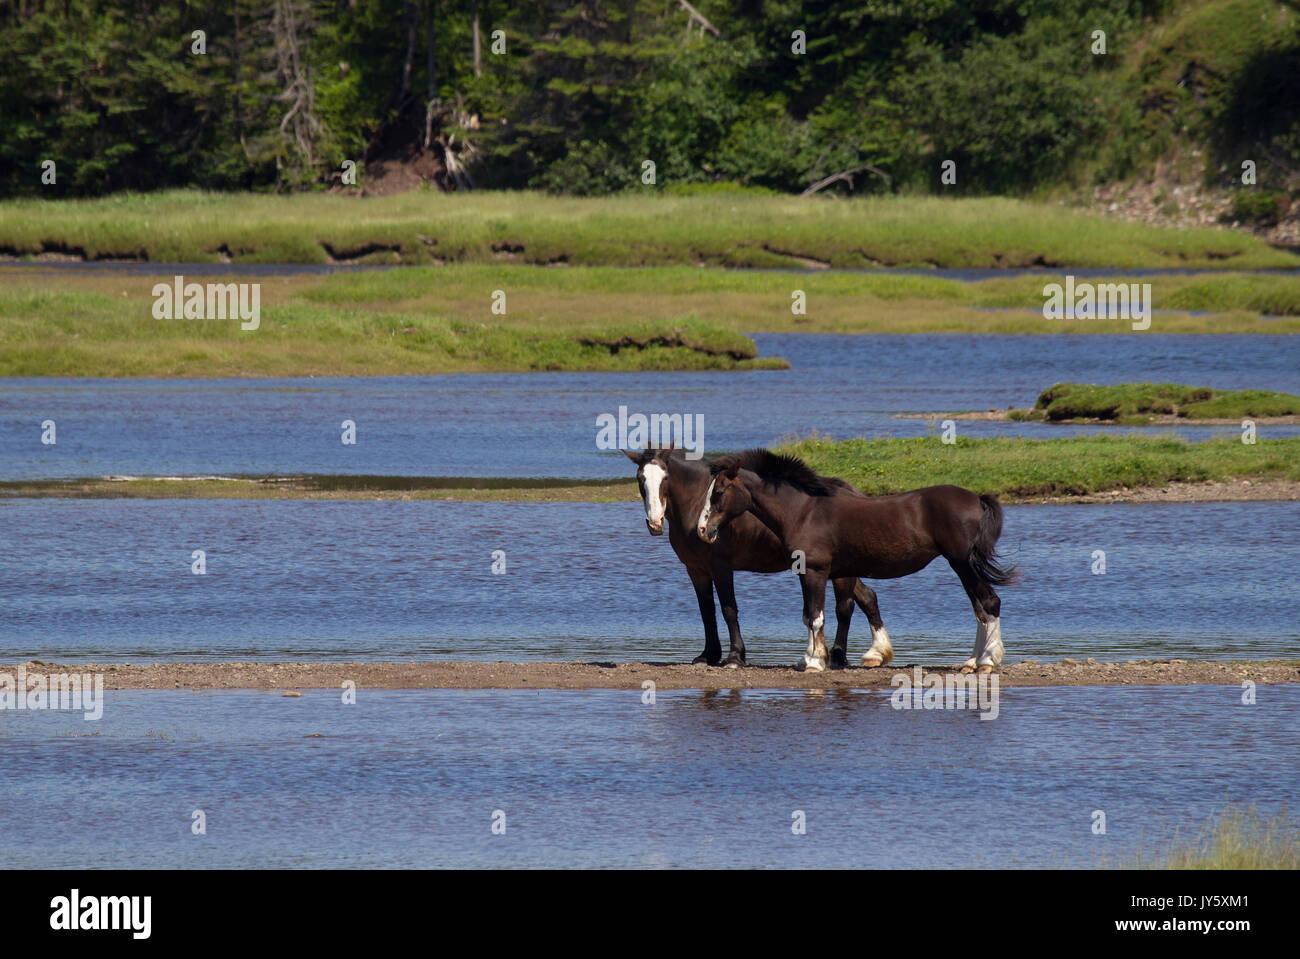 Two Draft Horses - Stock Image